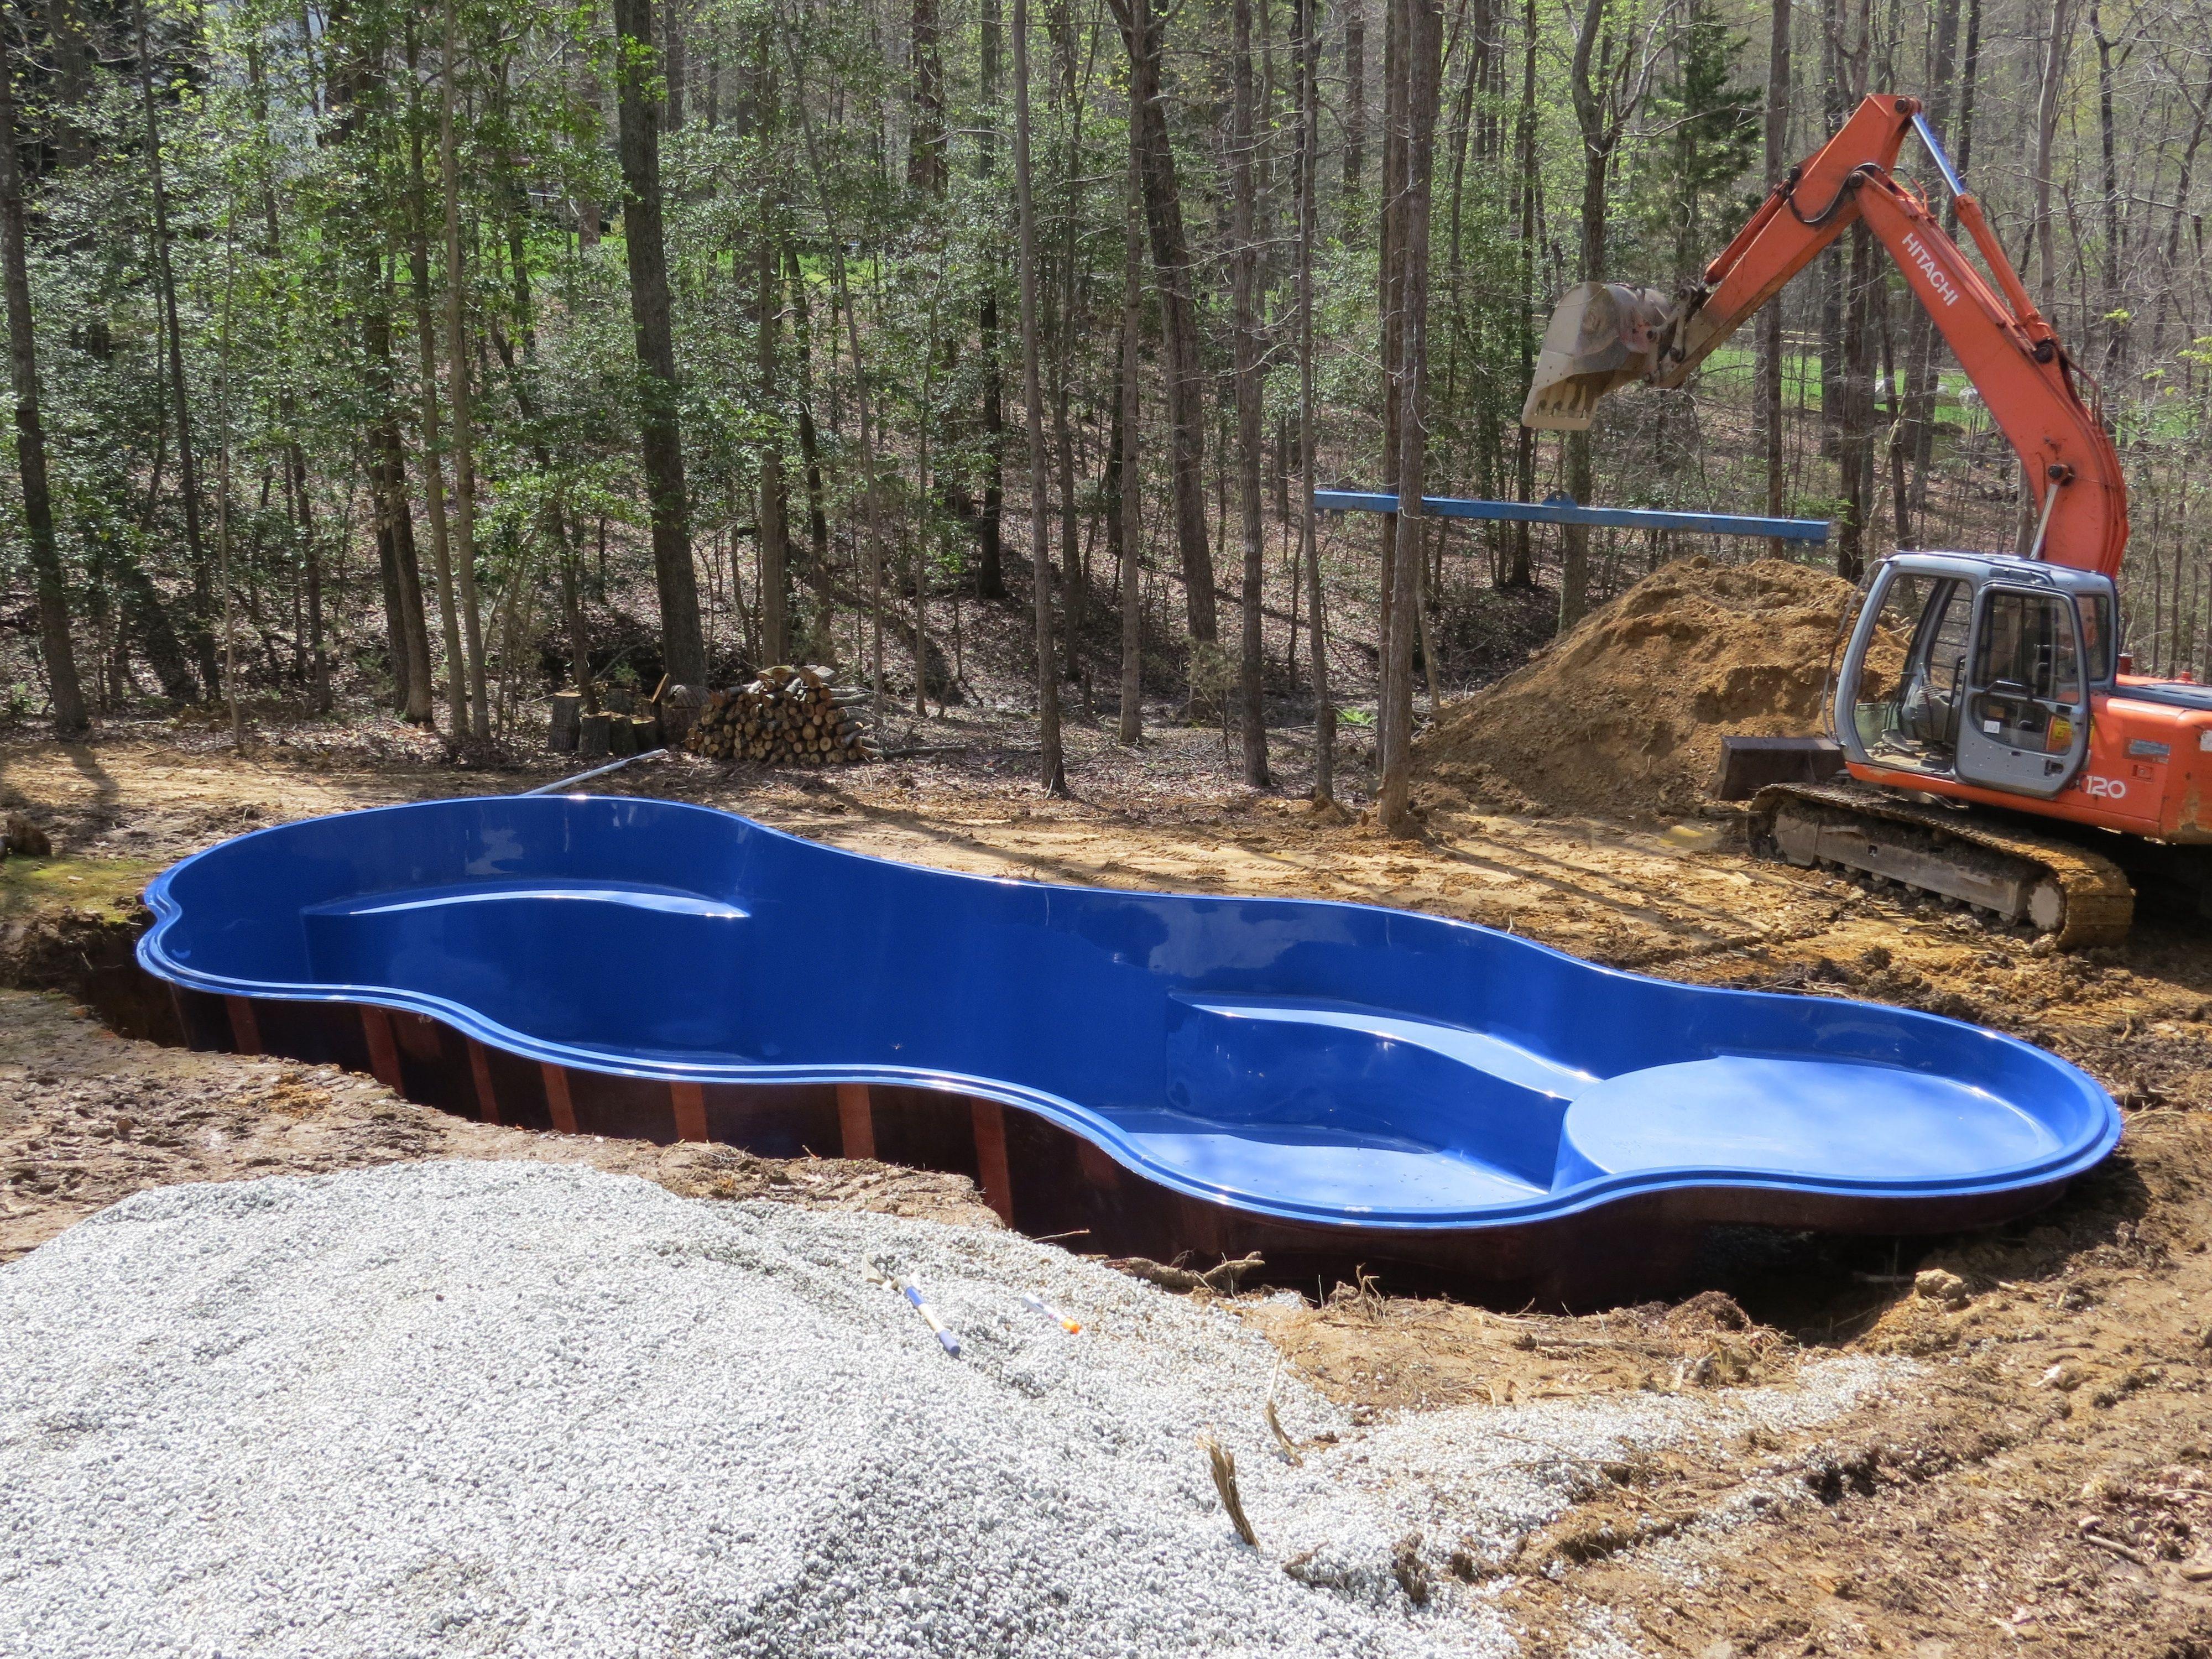 fiberglass pool with tanning ledge | Pools backyard ...